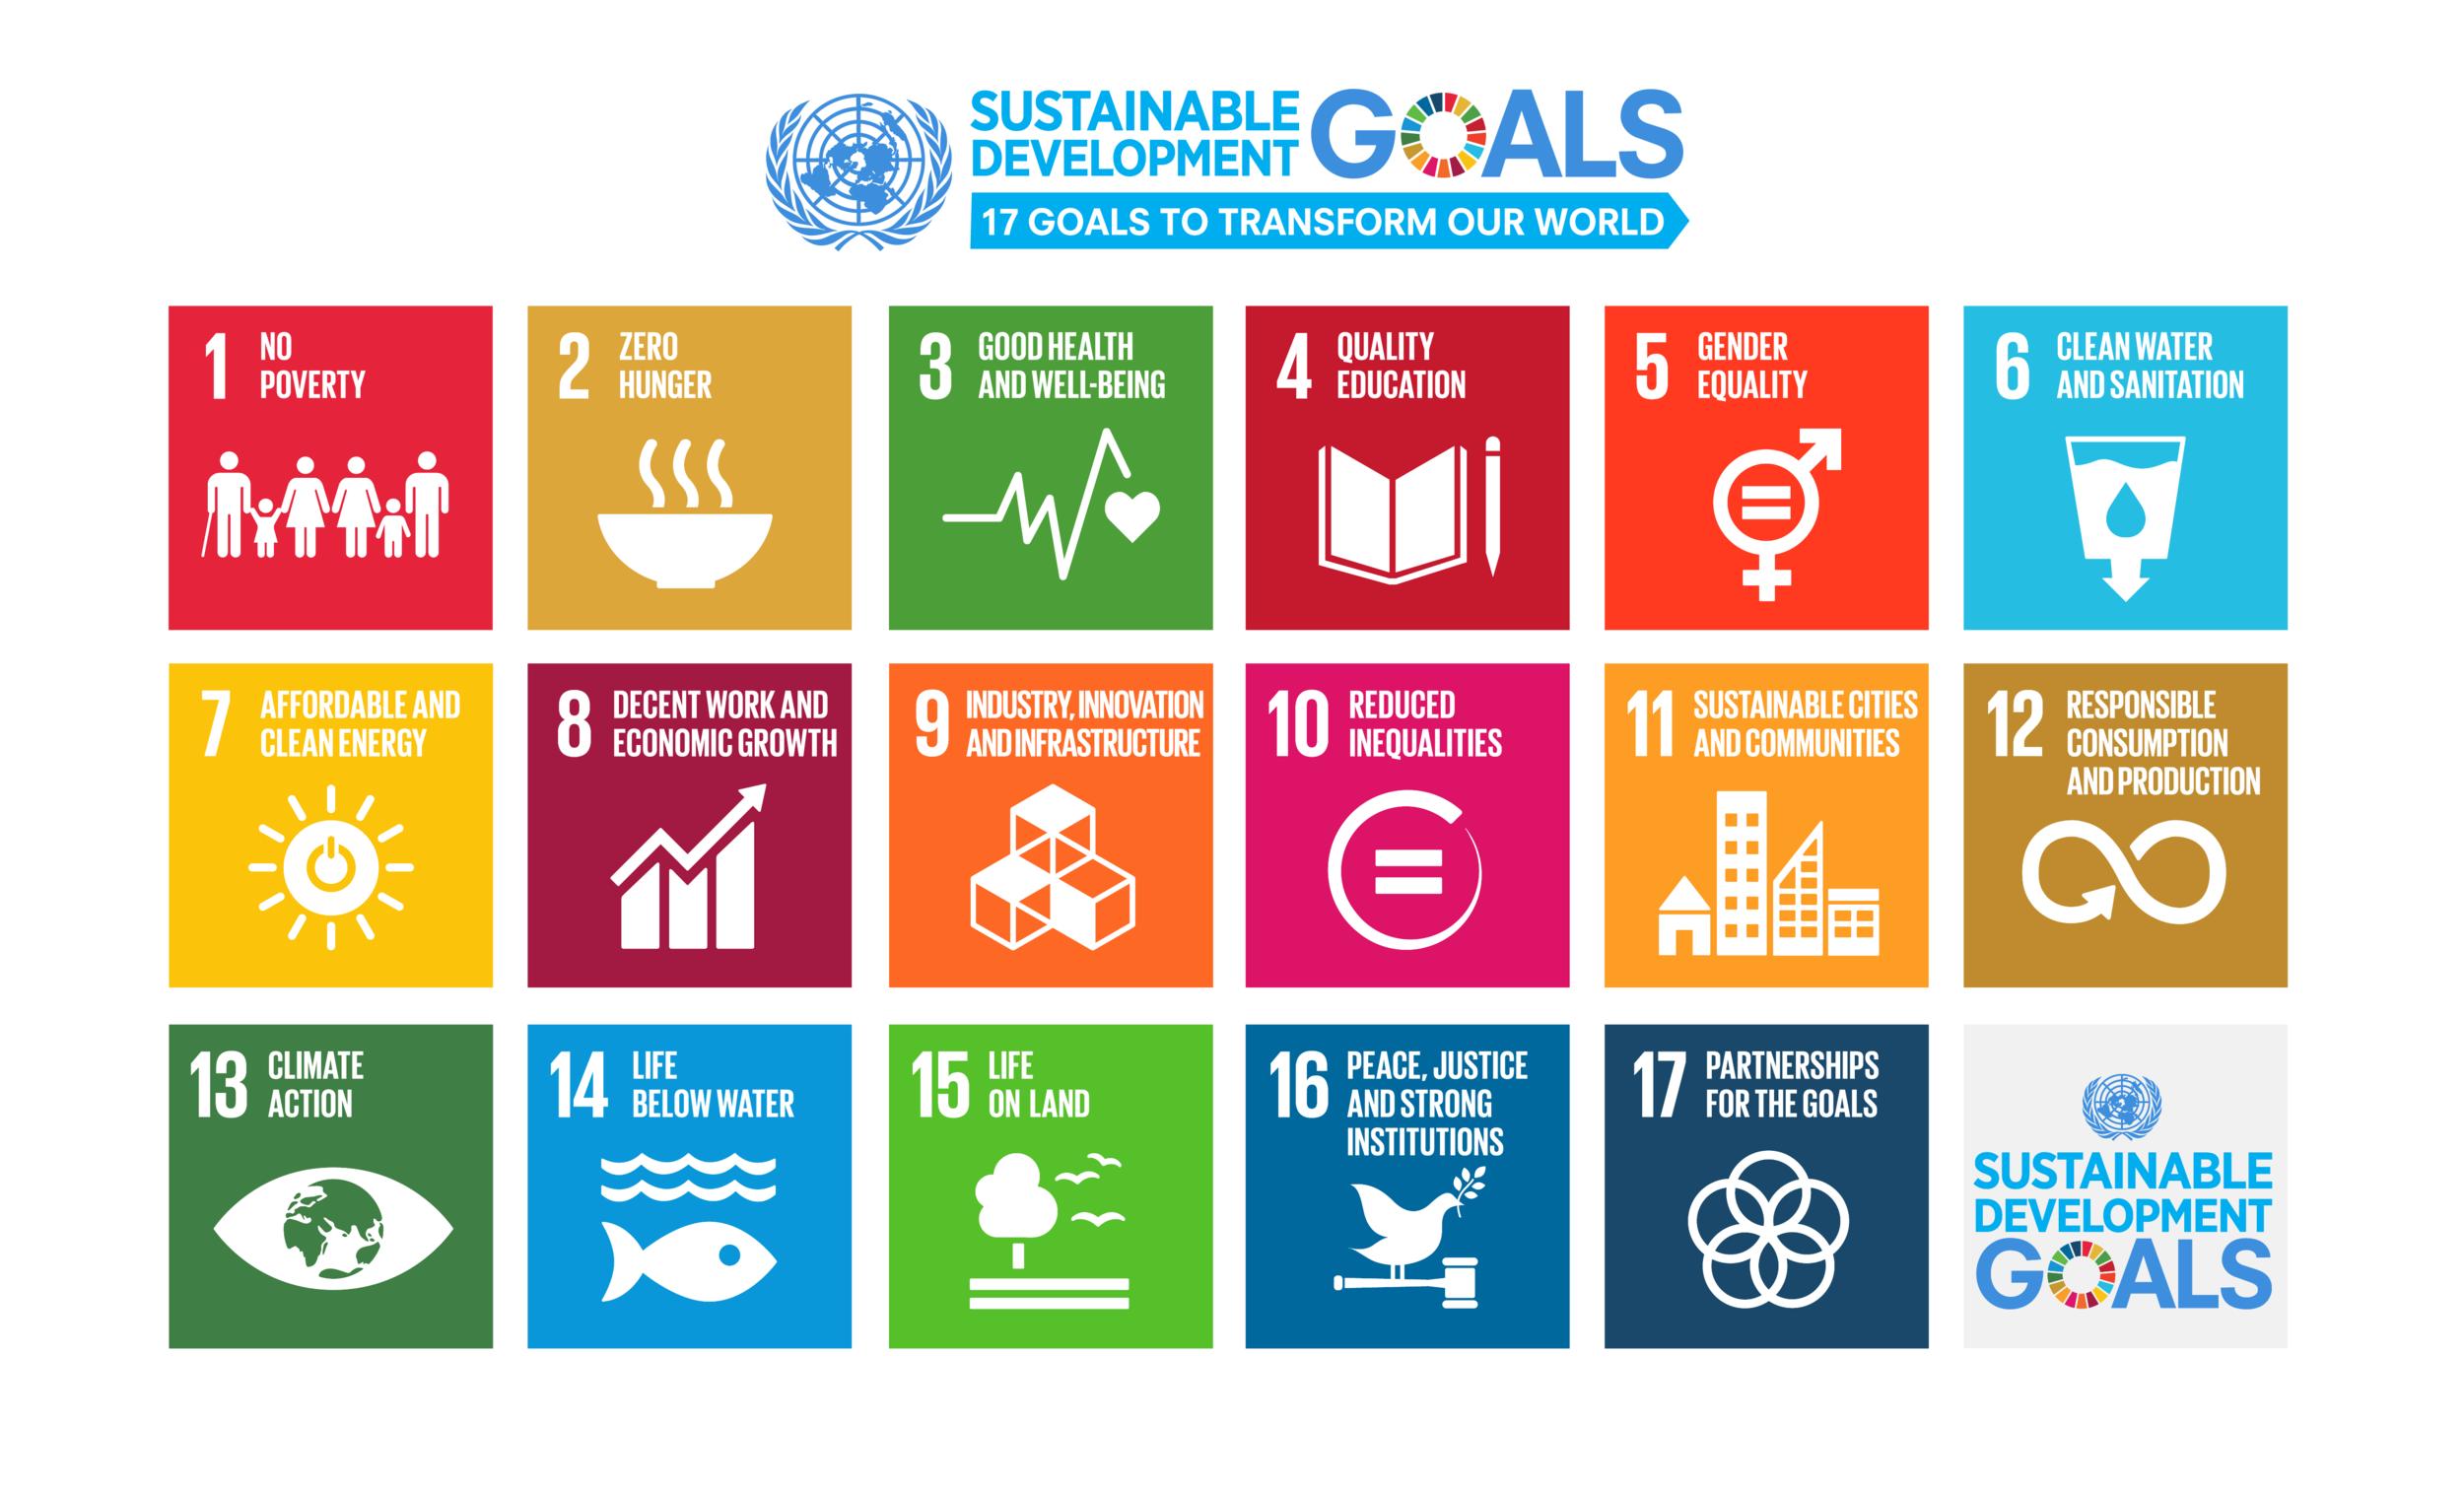 Sustainable Development Goals 2015